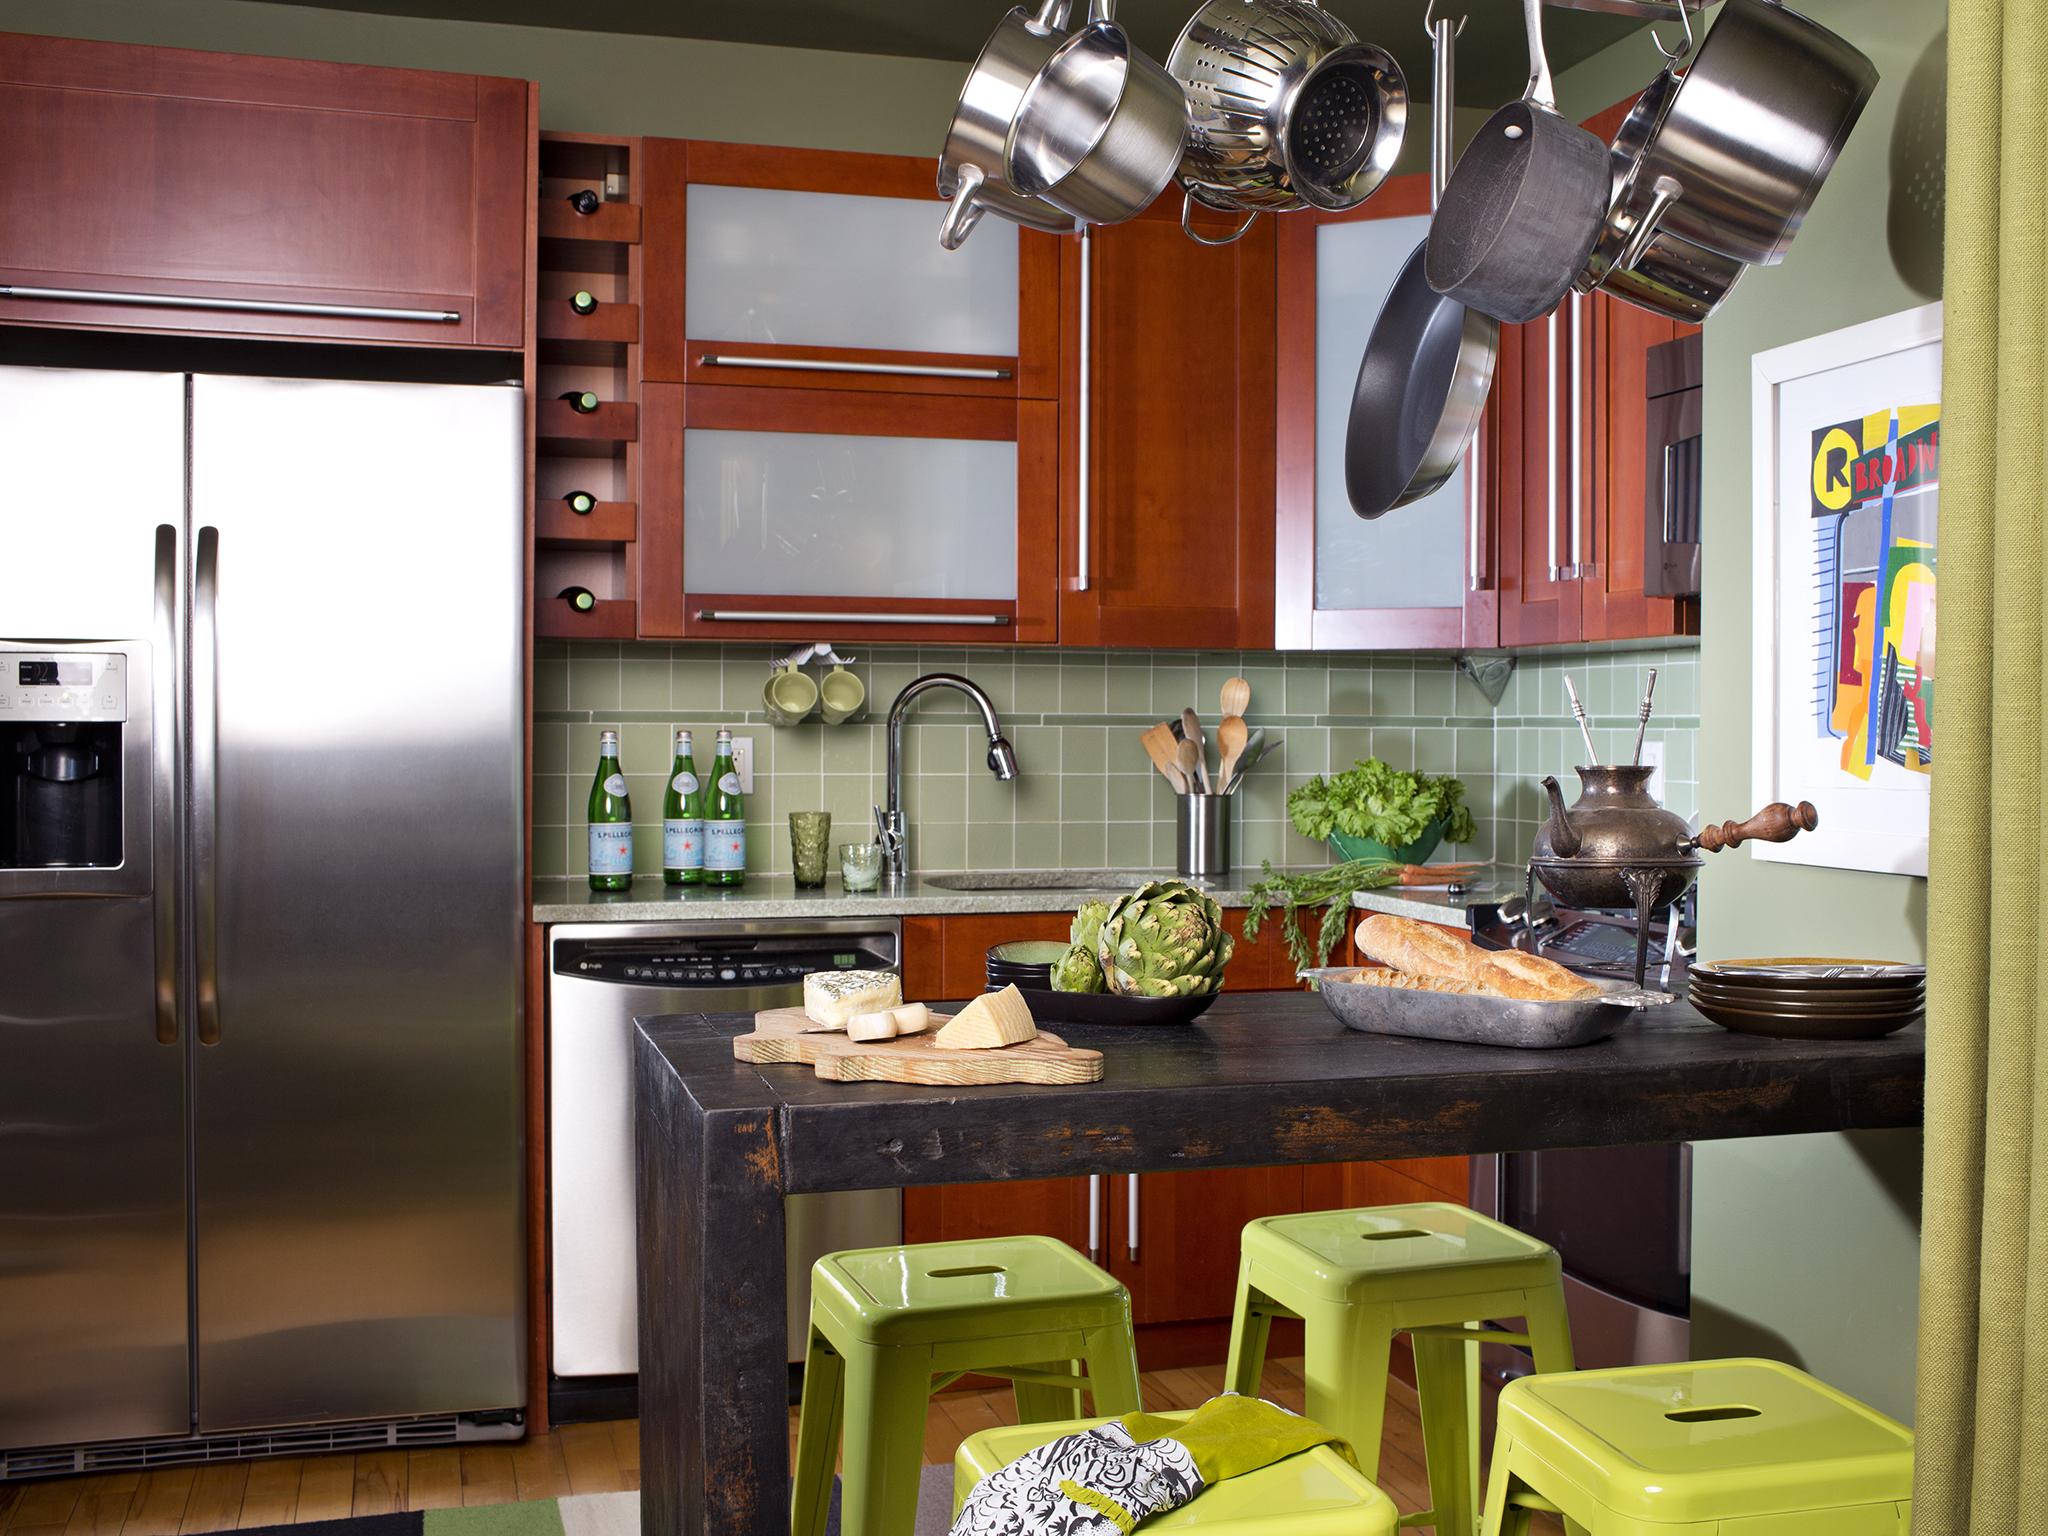 hgtv small kitchen designs photo - 2